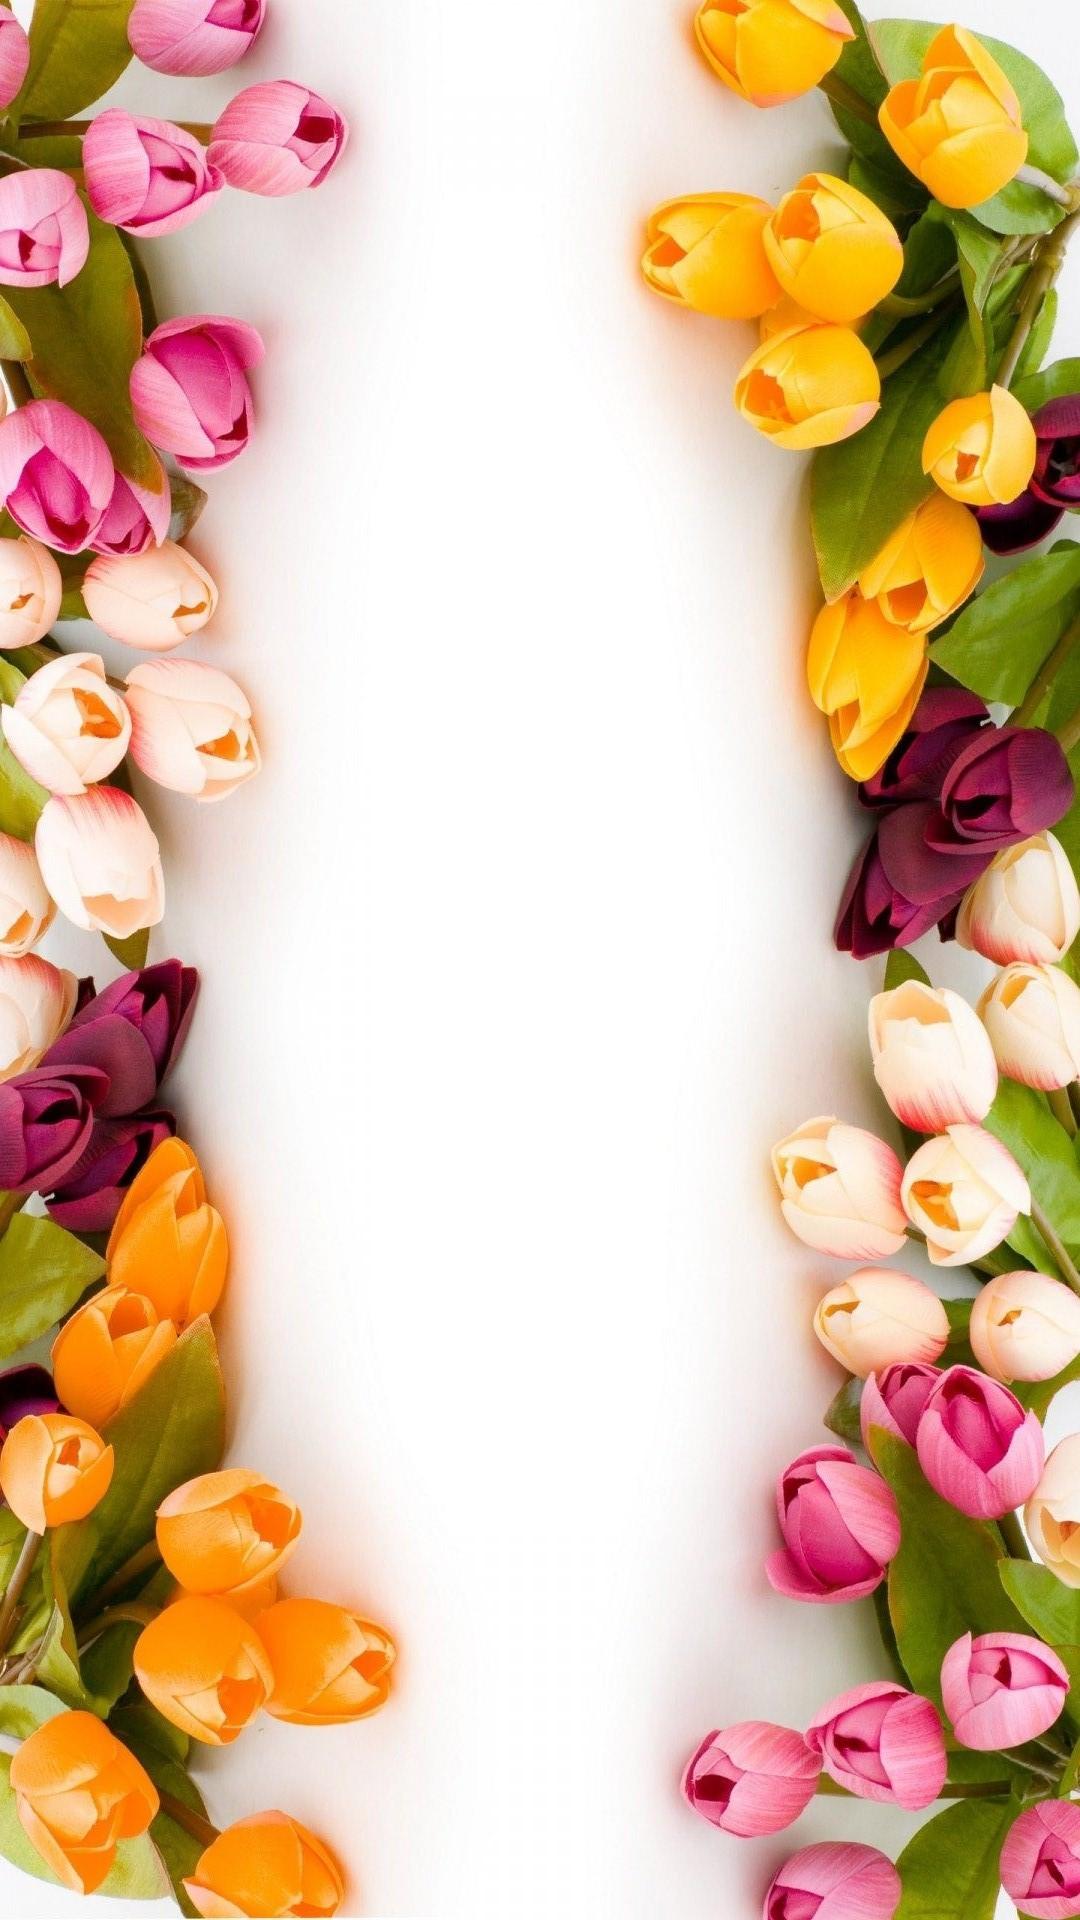 Desktop Backgrounds Wallpapers Tulip Flowers Flowers Healthy